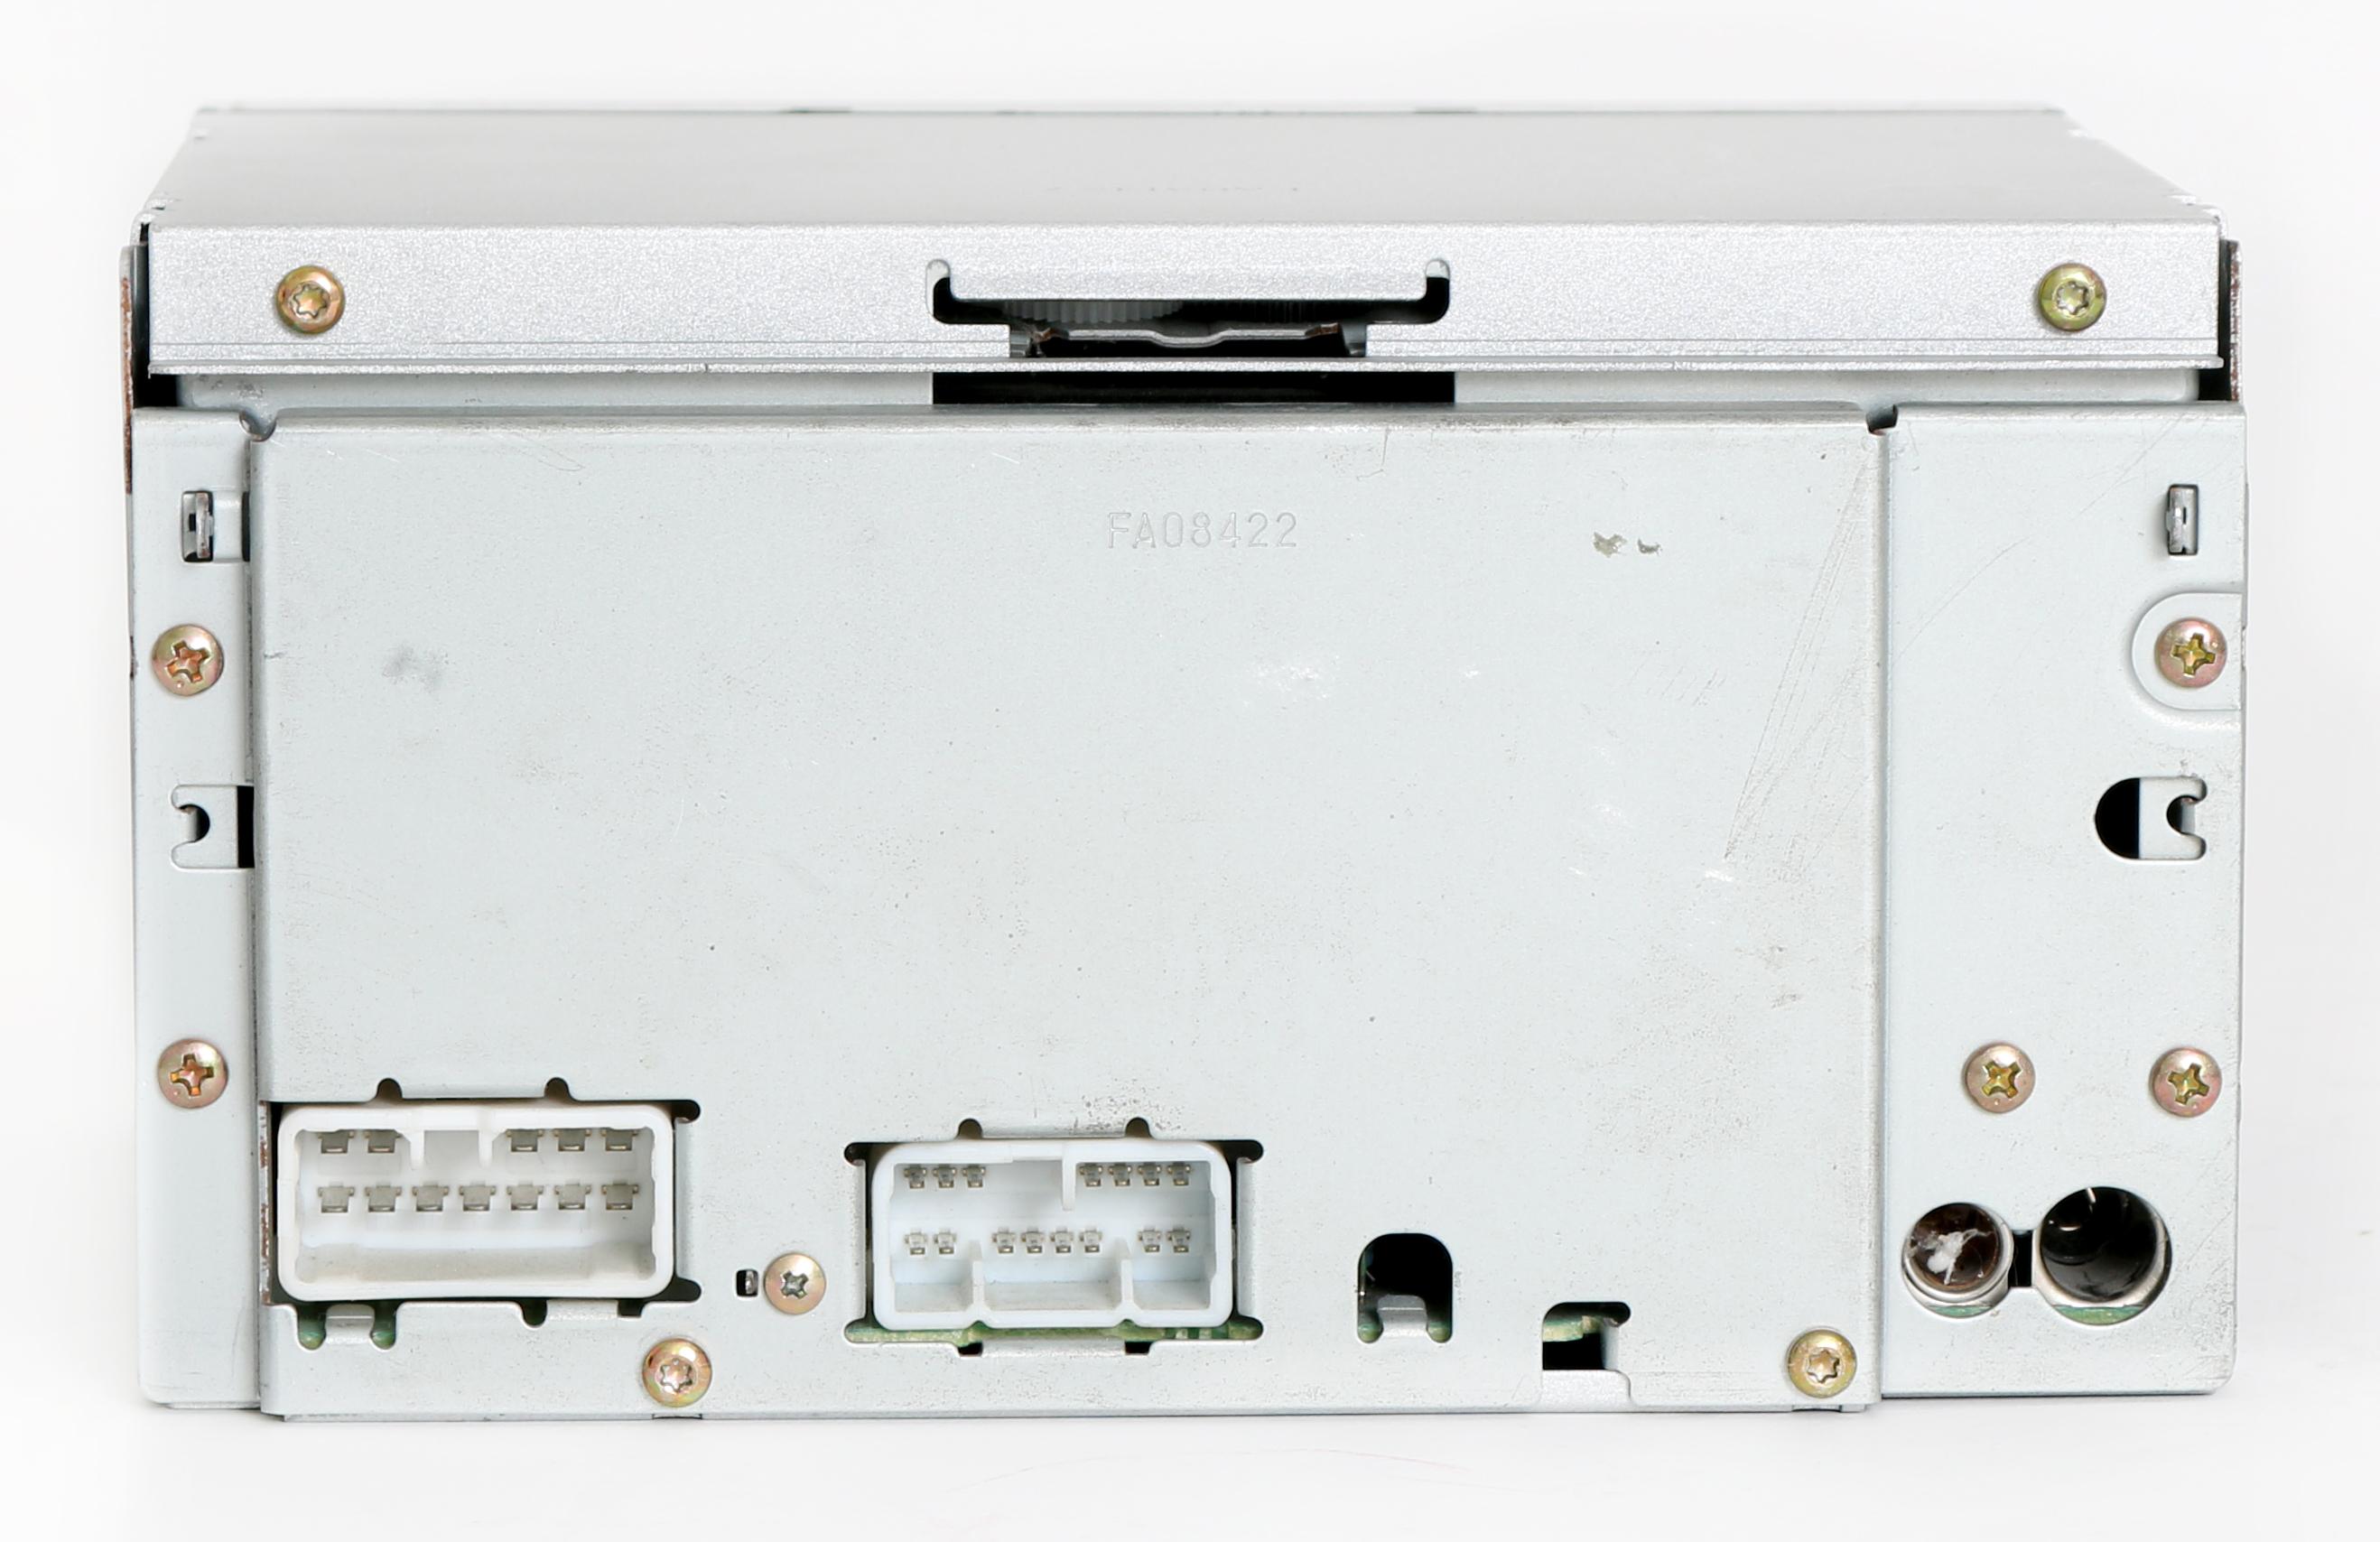 Toyota 4runner Camry 95 00 Radio Am Fm Cs Cd Bluetooth Muisc 86120 Lexus Wiring Diagram 35170 56808 1 Factory